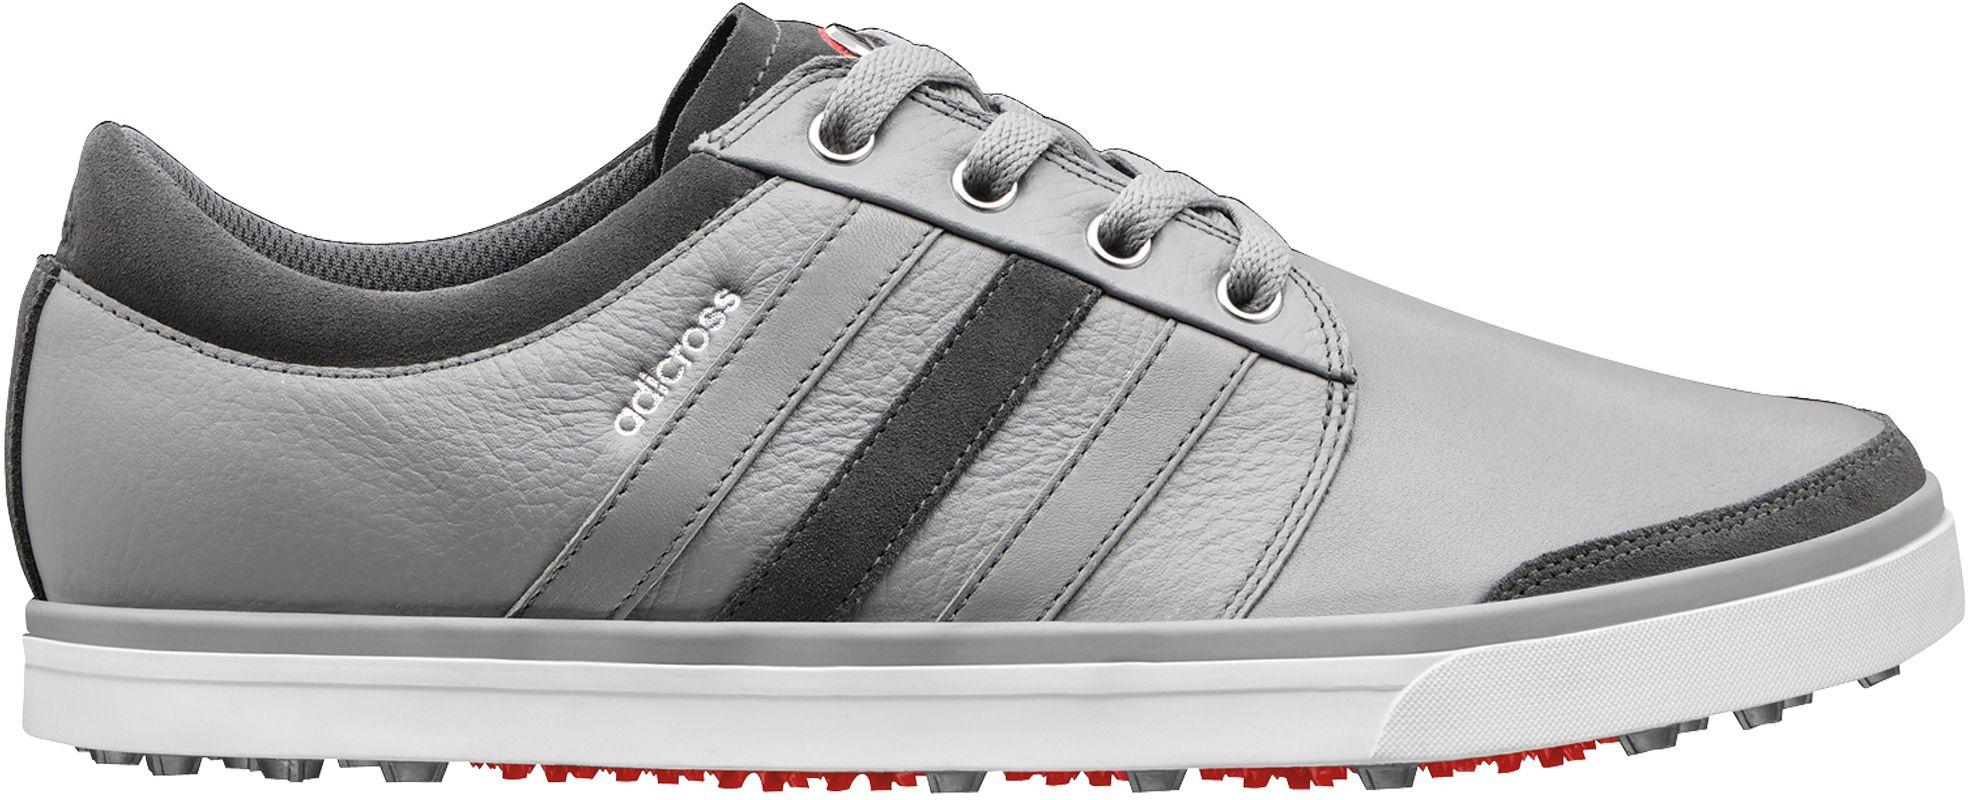 adidas adicross gripmore scarpe da golf, golf, galassia